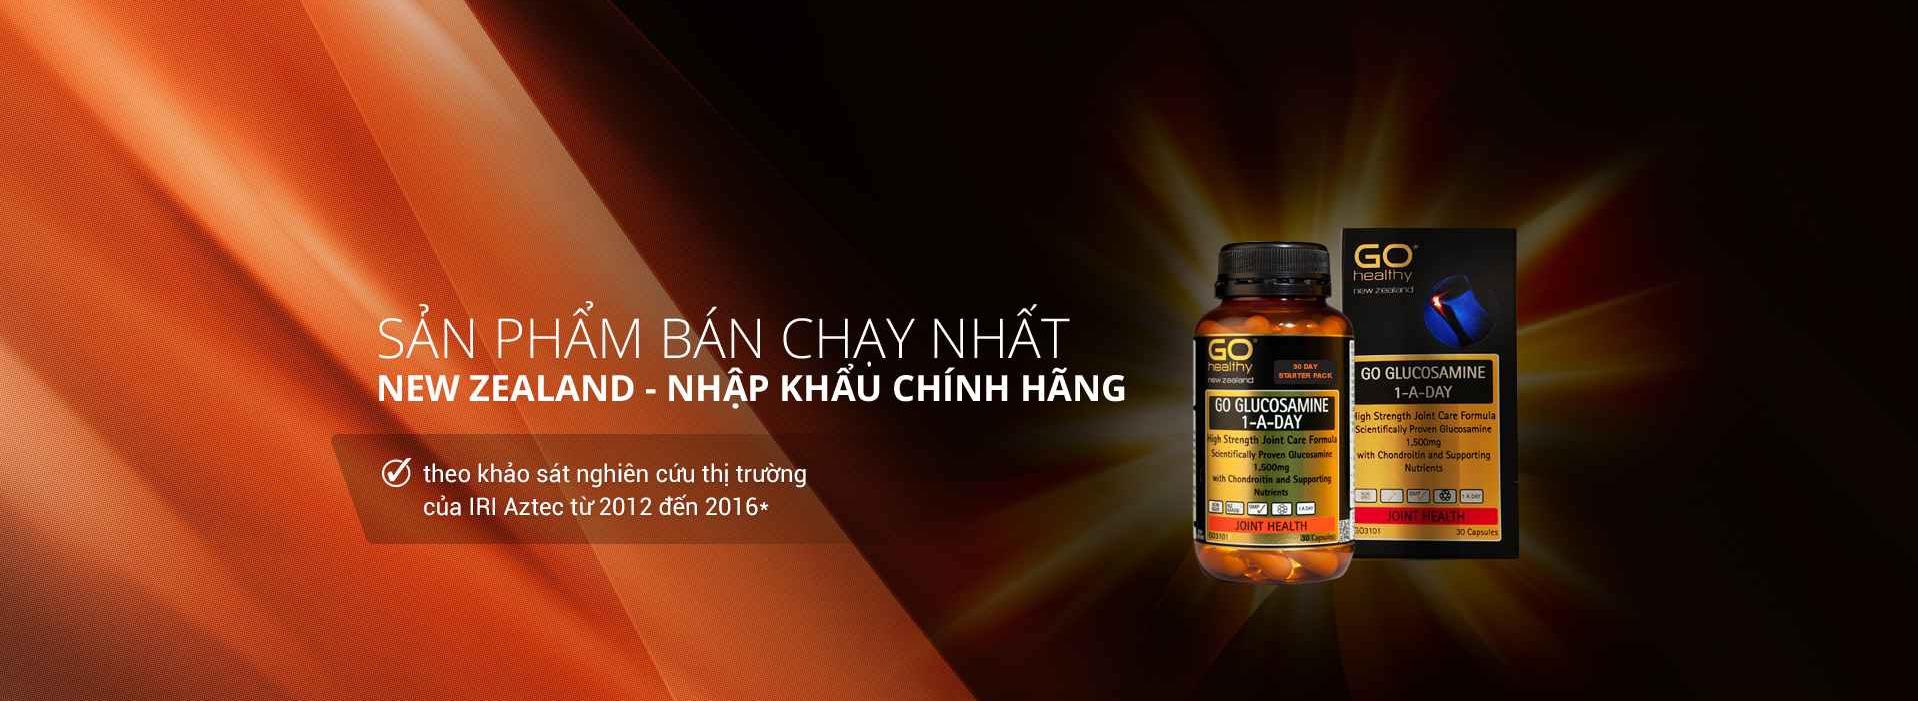 Vien Xuong Khop Go Glucosamine